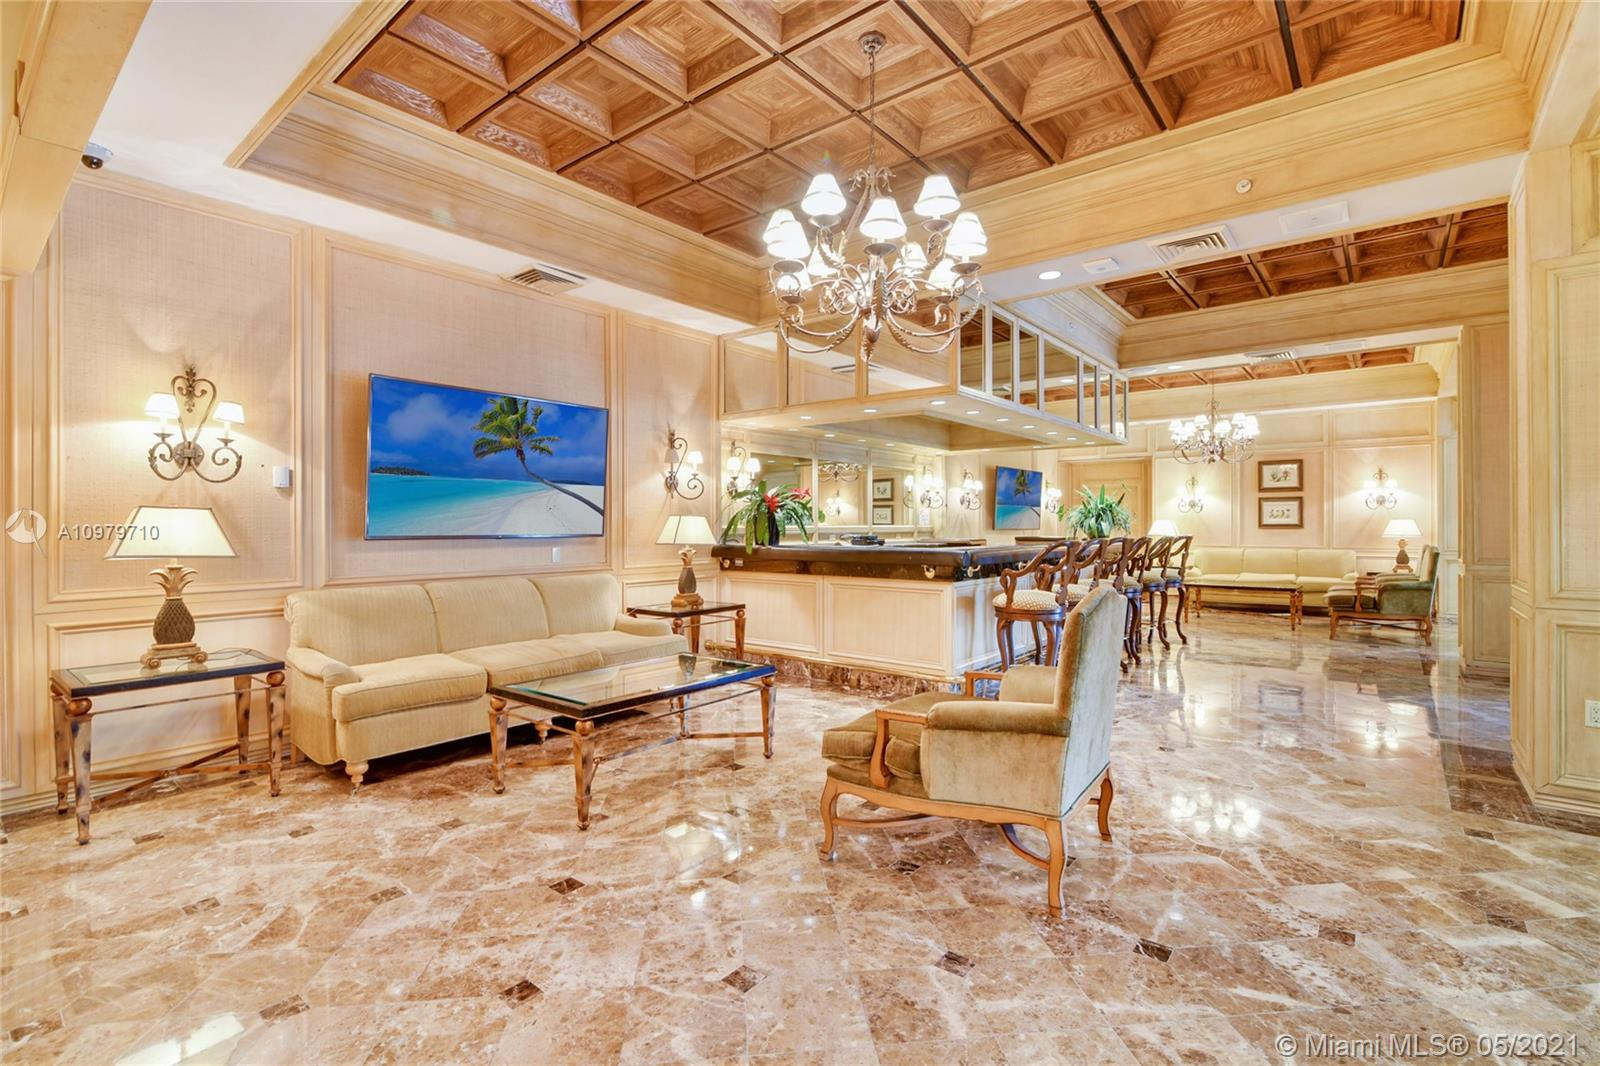 Photo of 9801 Collins Ave #10R, Bal Harbour, Florida, 33154 - Balmoral Hair salon, Dentist office, Spa, Taylor